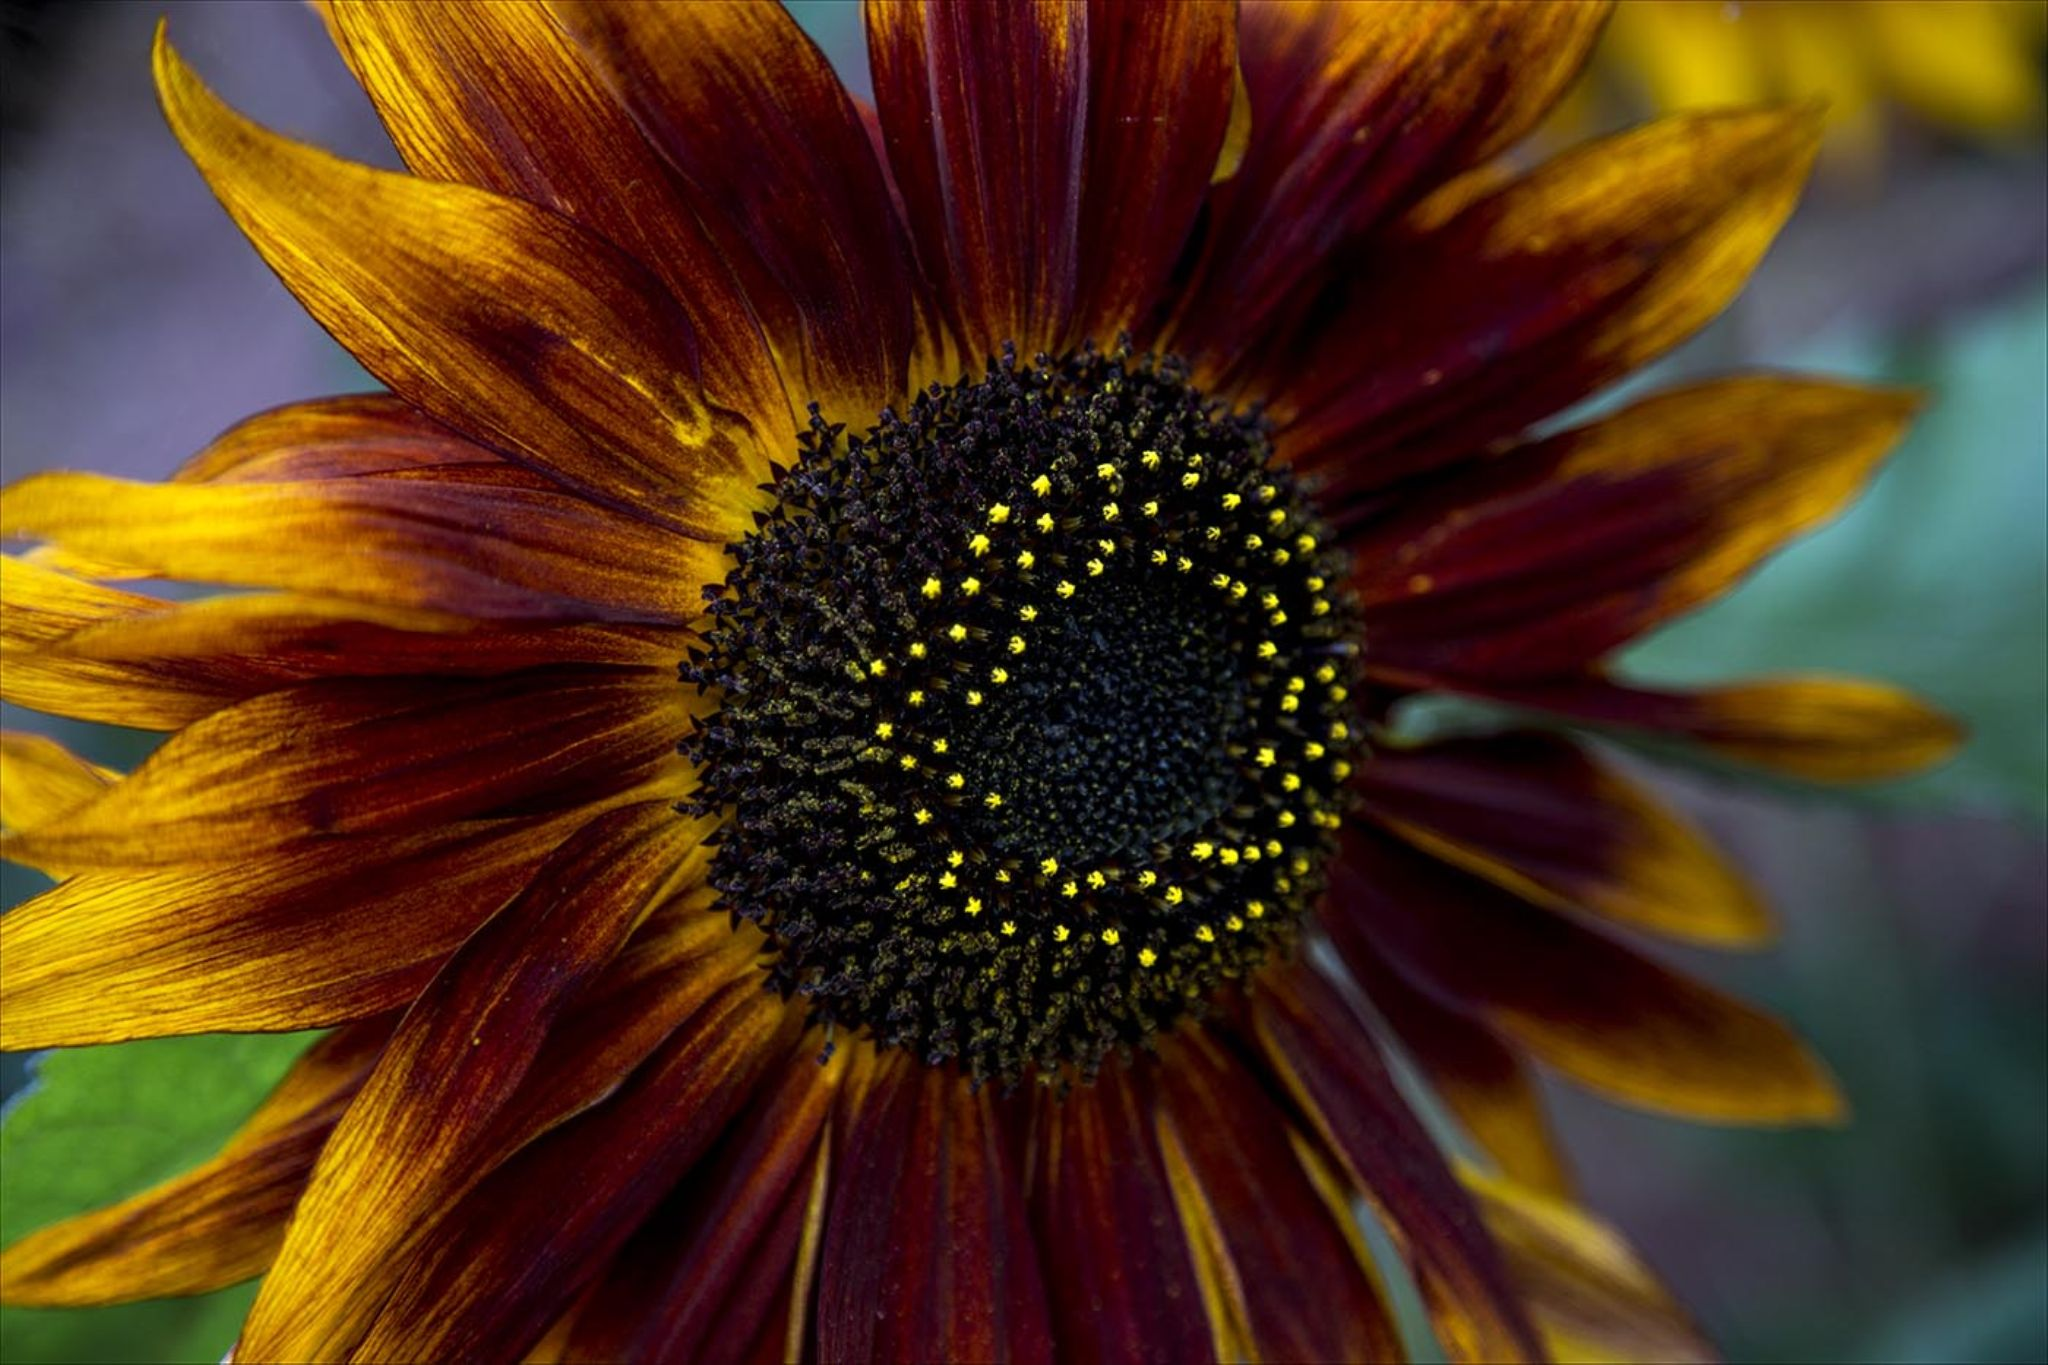 Sunflower by ian.bridgephotography